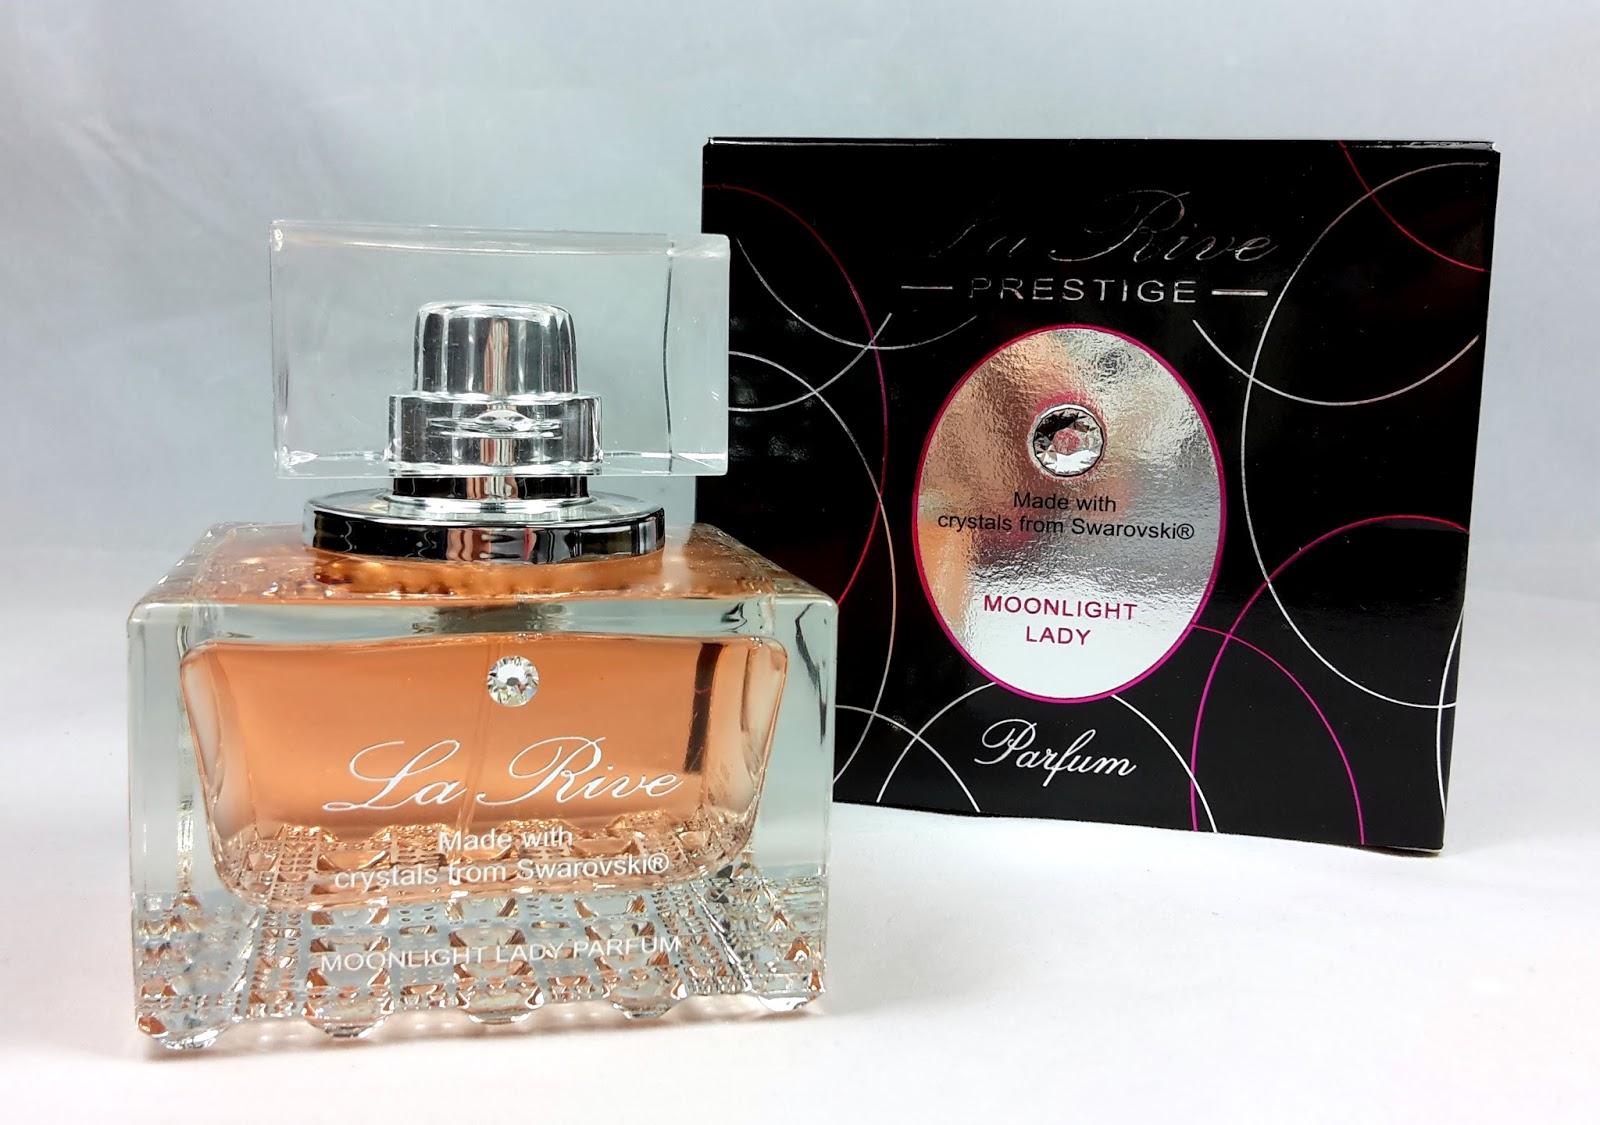 Colibrigwen Ausgepackt La Rive Prestige Reihe Extreme Story For Men Edt 75ml Moonlight Lady Perfum 75 Ml